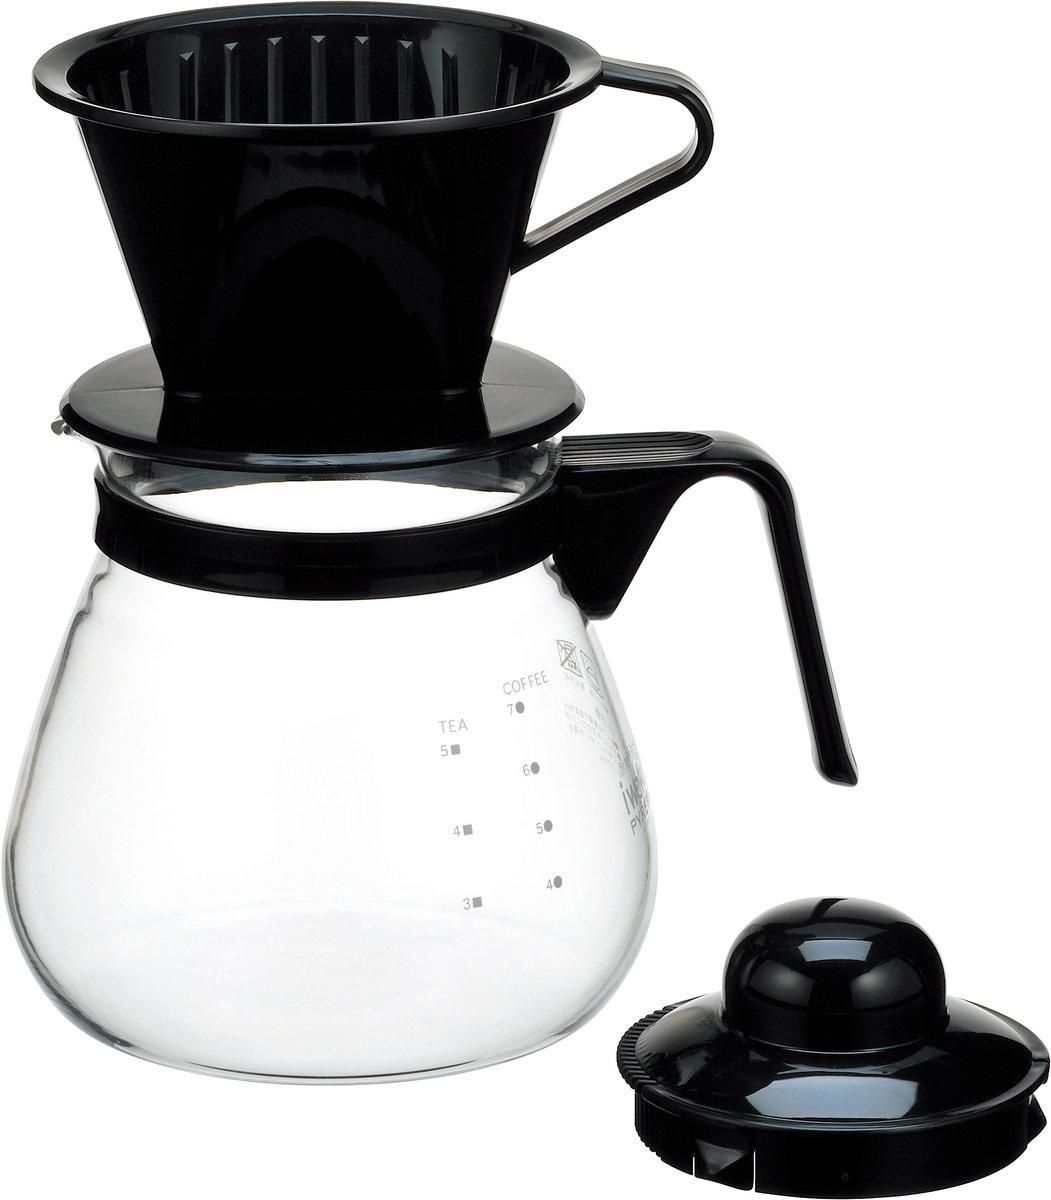 Iwaki 1l Drip Server Hktvmall Online Shopping Water Coffee 4 Cup